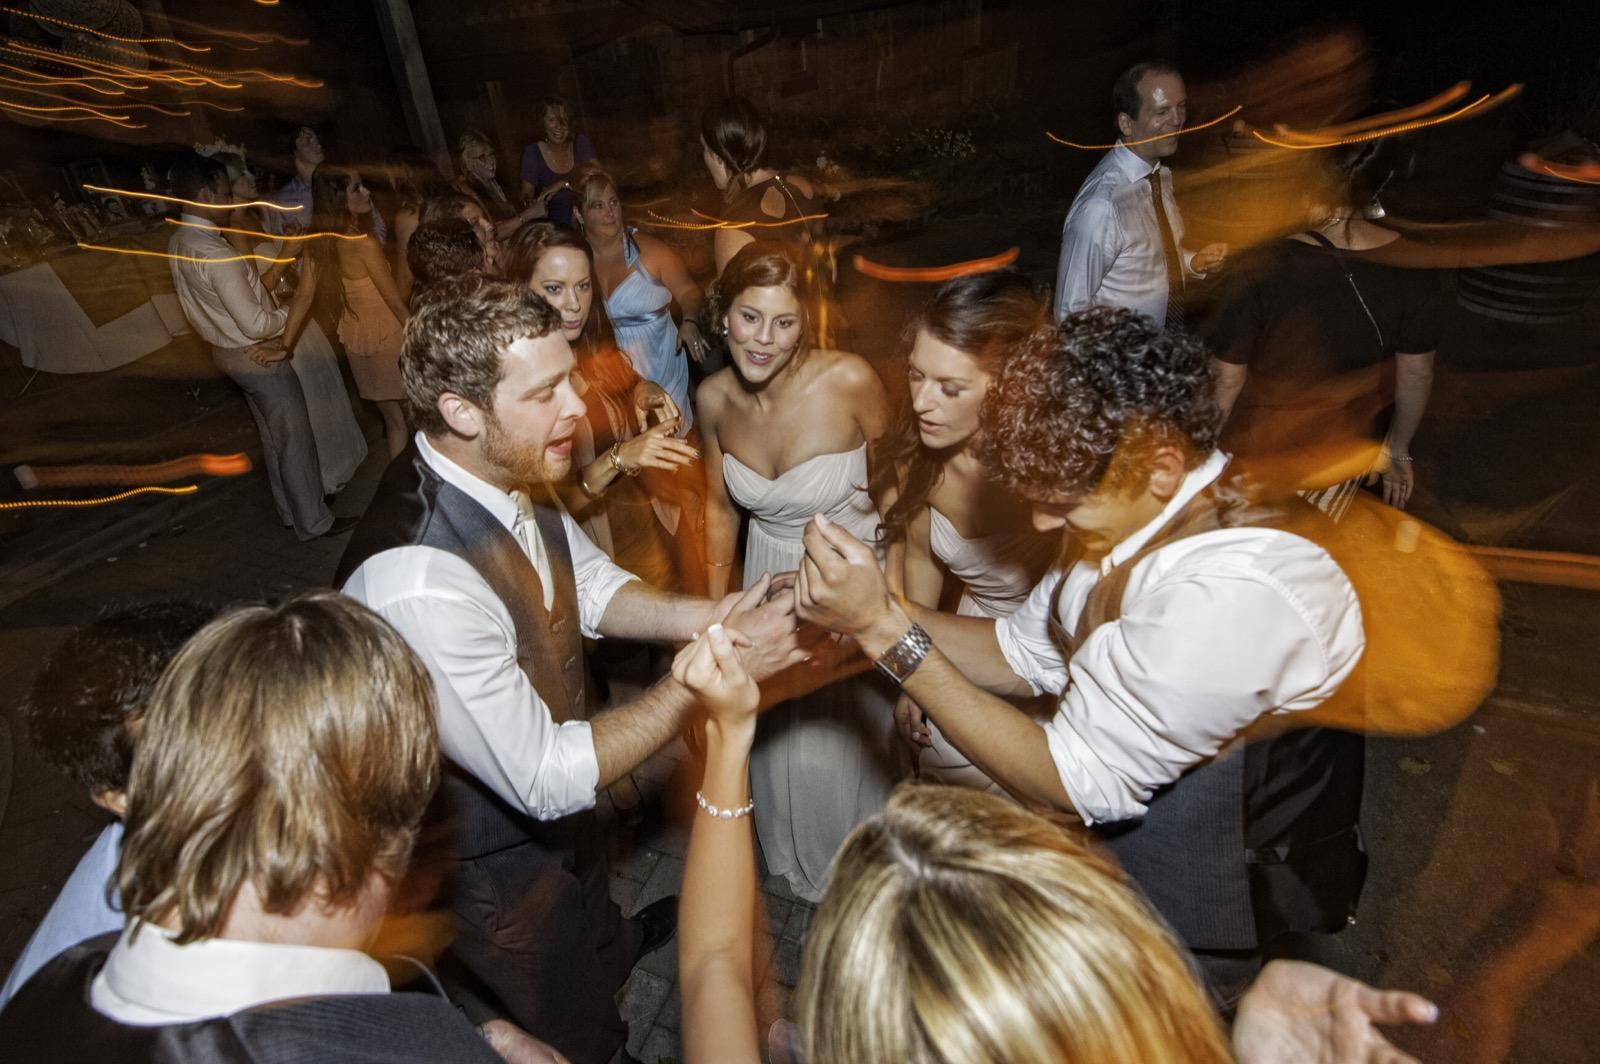 sooke-wedding-photographers-craidelonna-oceanedge-lodge-wedding-90.jpg